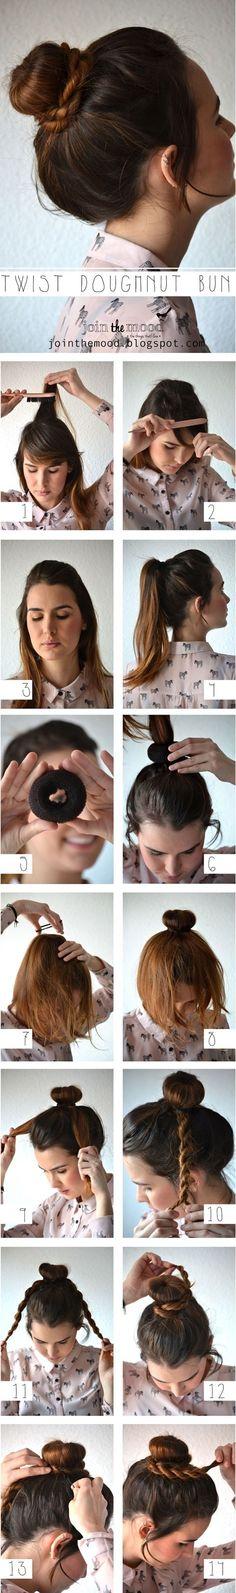 How to - twist doughnut bun